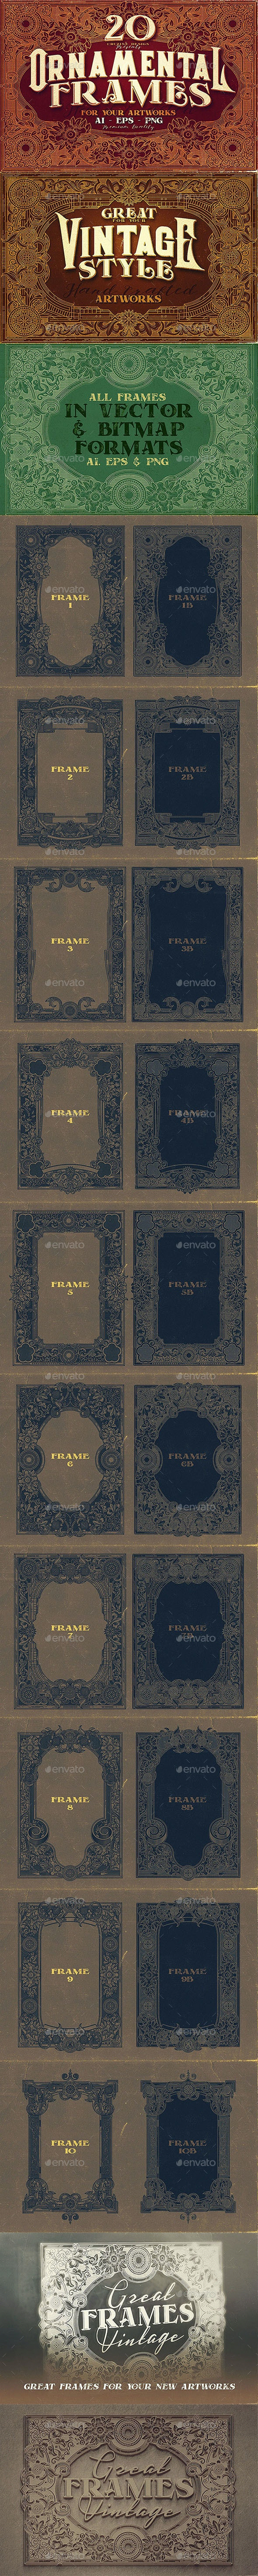 20 Ornamental Vintage Frames - Decorative Graphics